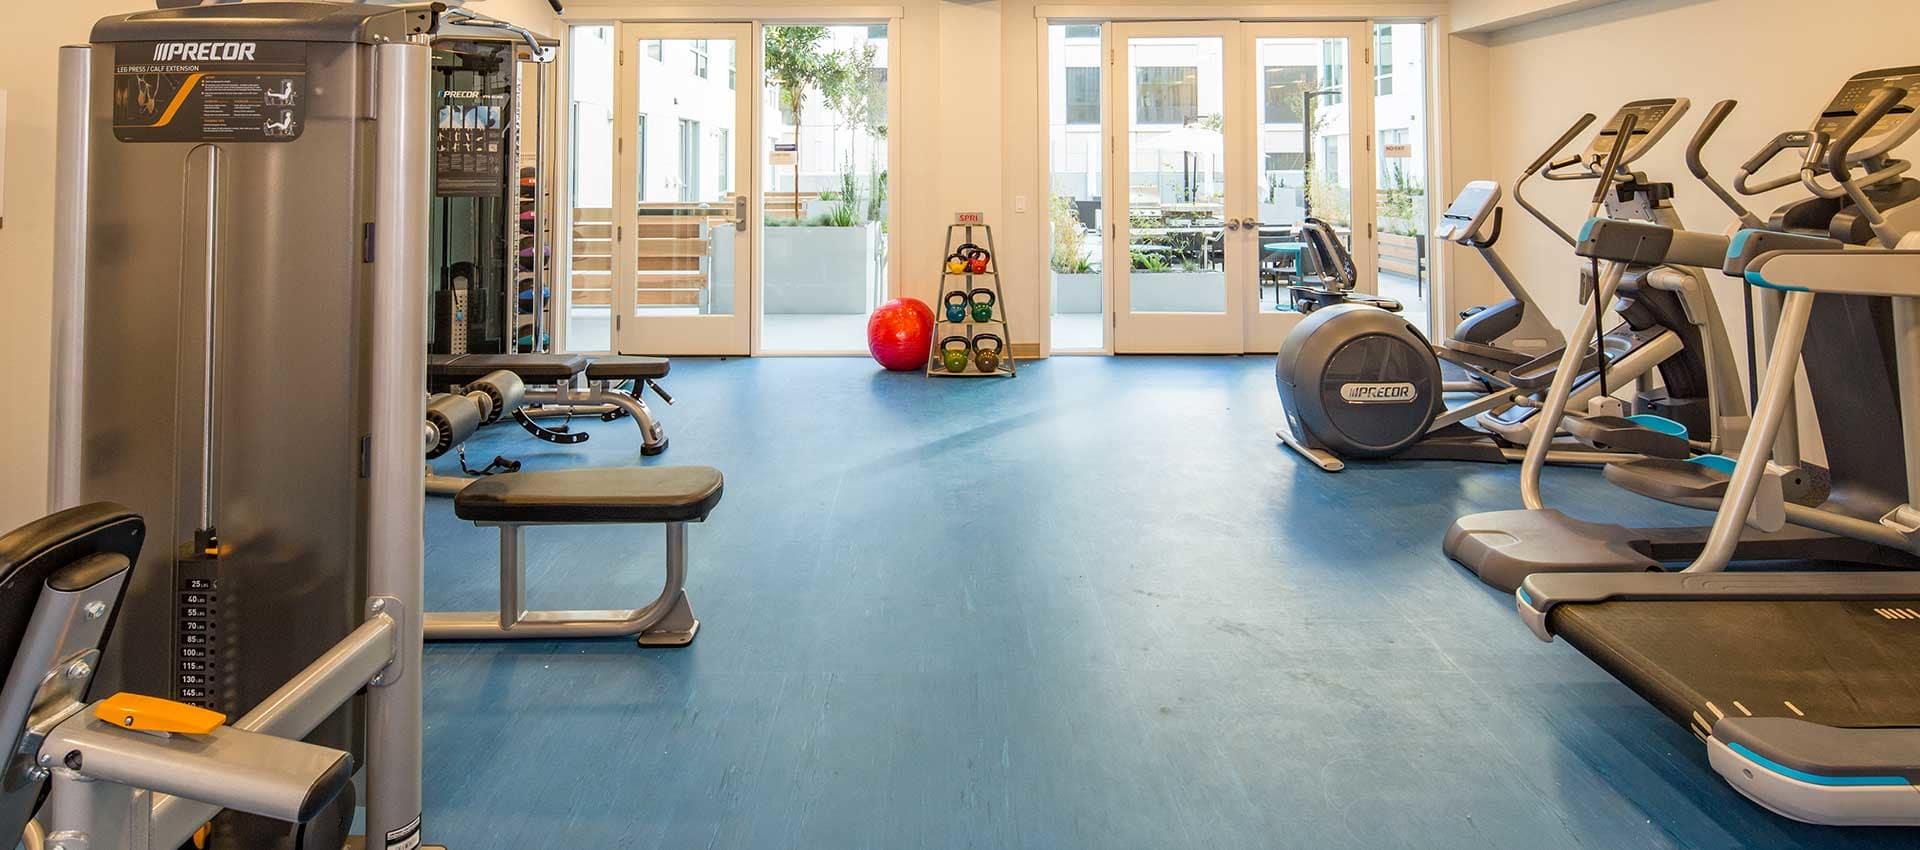 EVIVA Midtown fitness center in Sacramento, California